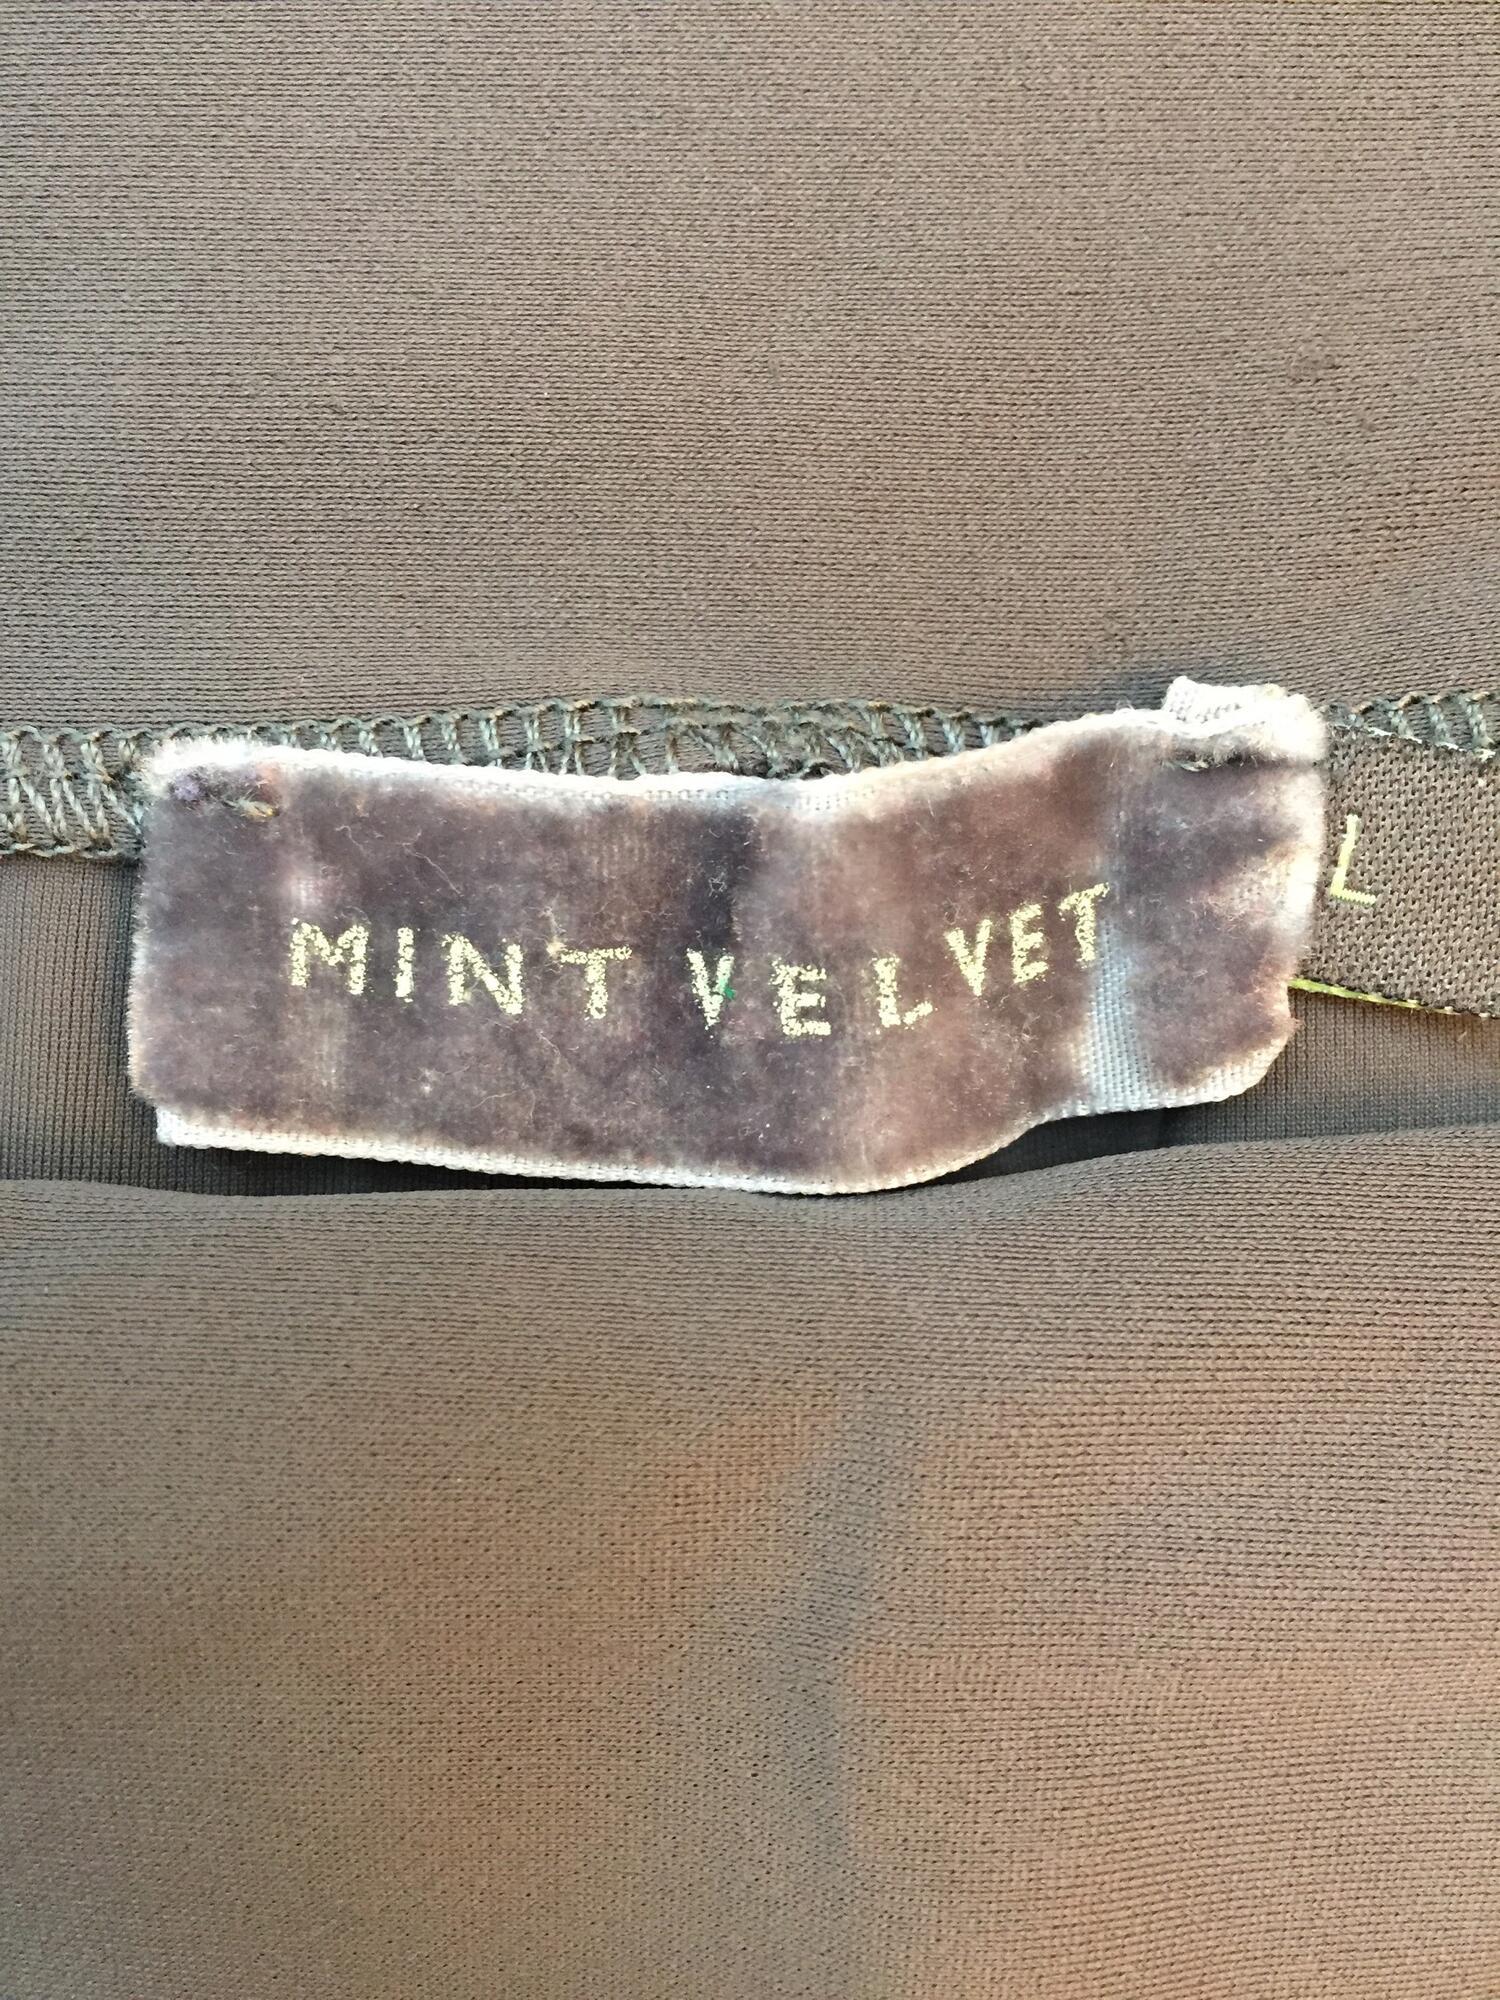 Leginsy Mint Velvet szare - Vintage Store | JestemSlow.pl